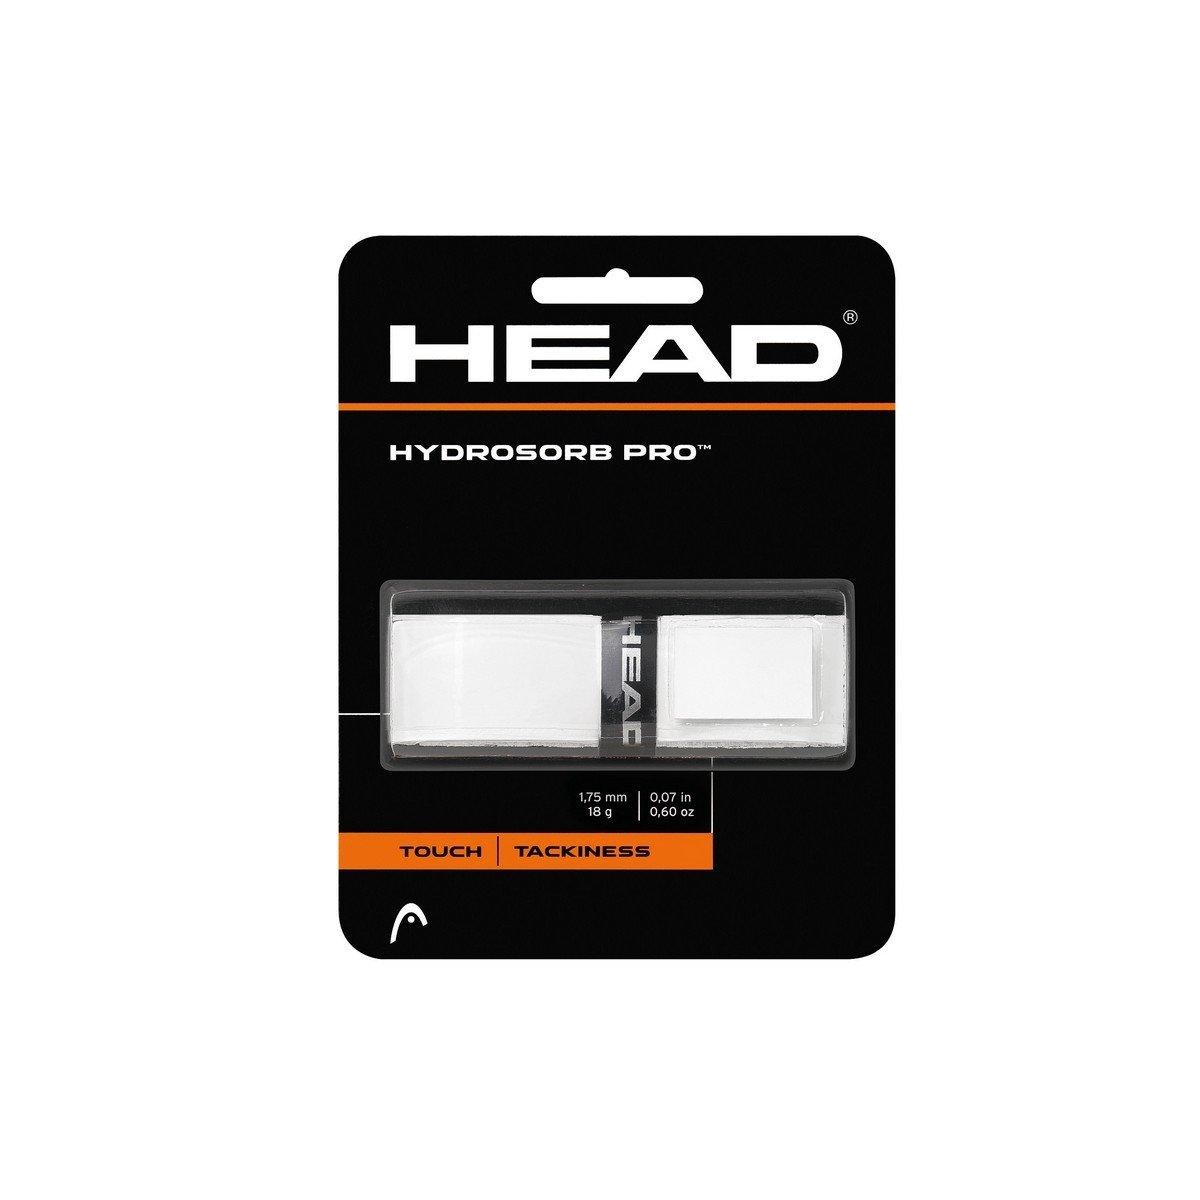 HEAD Hydrosorb Pro Replacement Grip, Black Head USA Inc. 285303